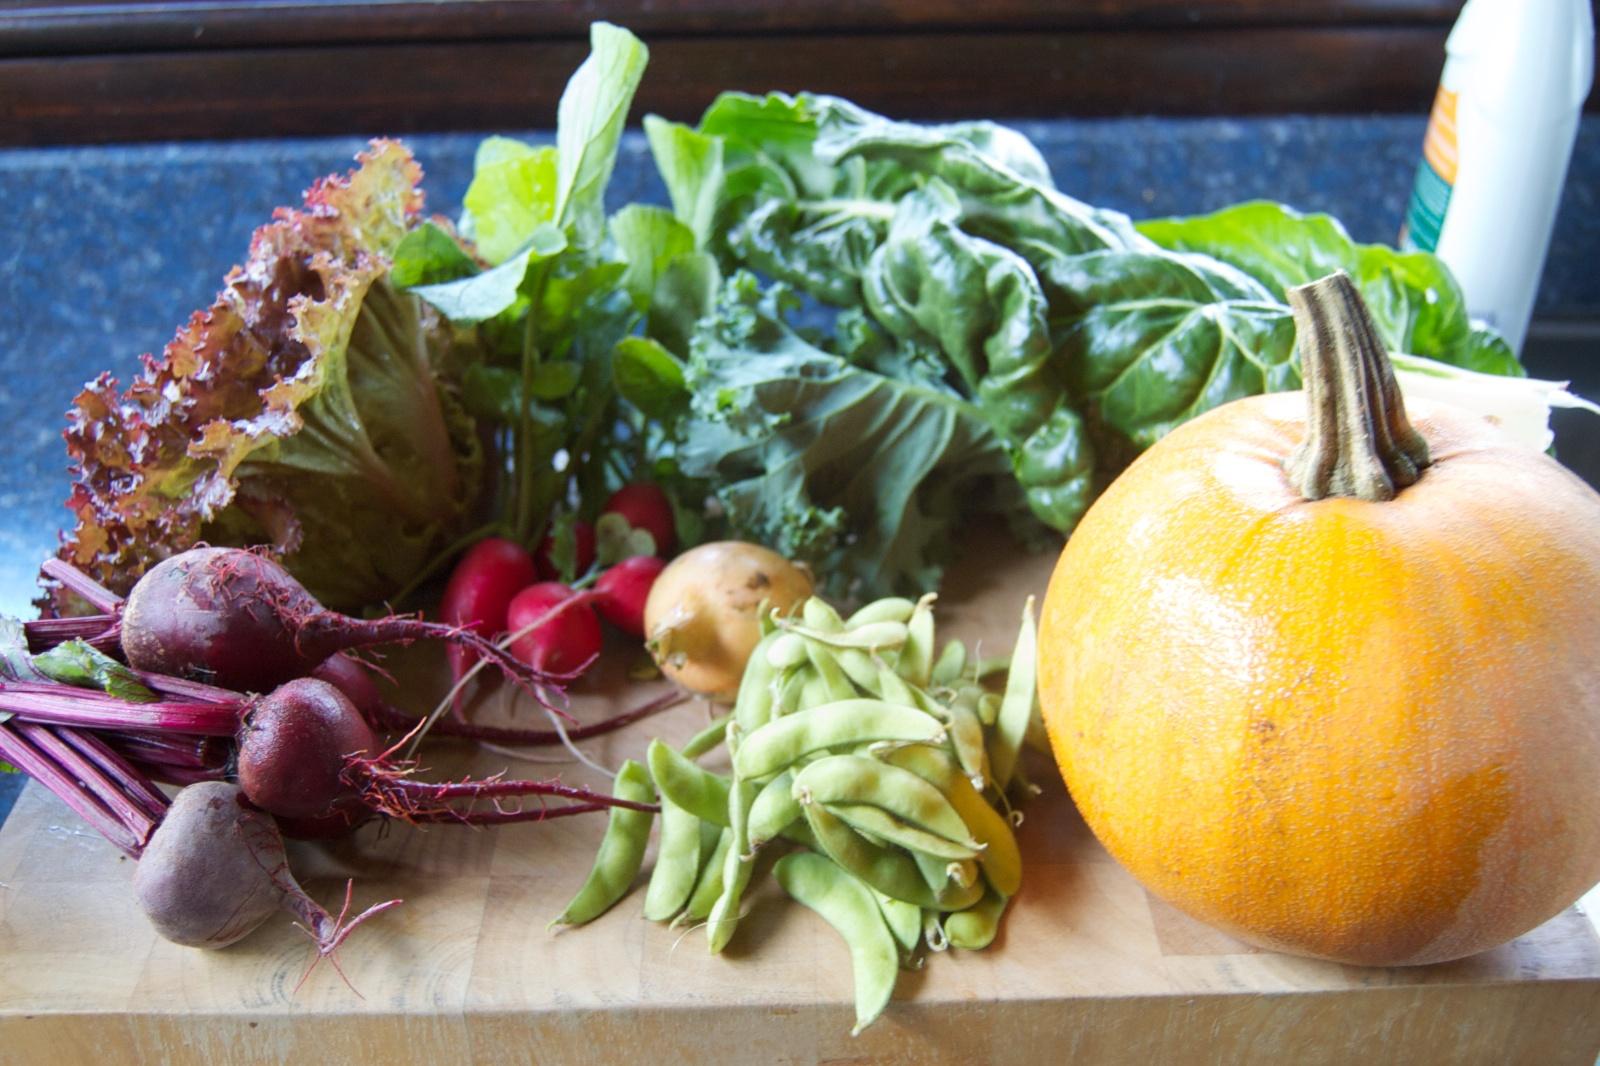 http://blog.rickk.com/food/2014/09/24/csa.2014.16.1.jpg